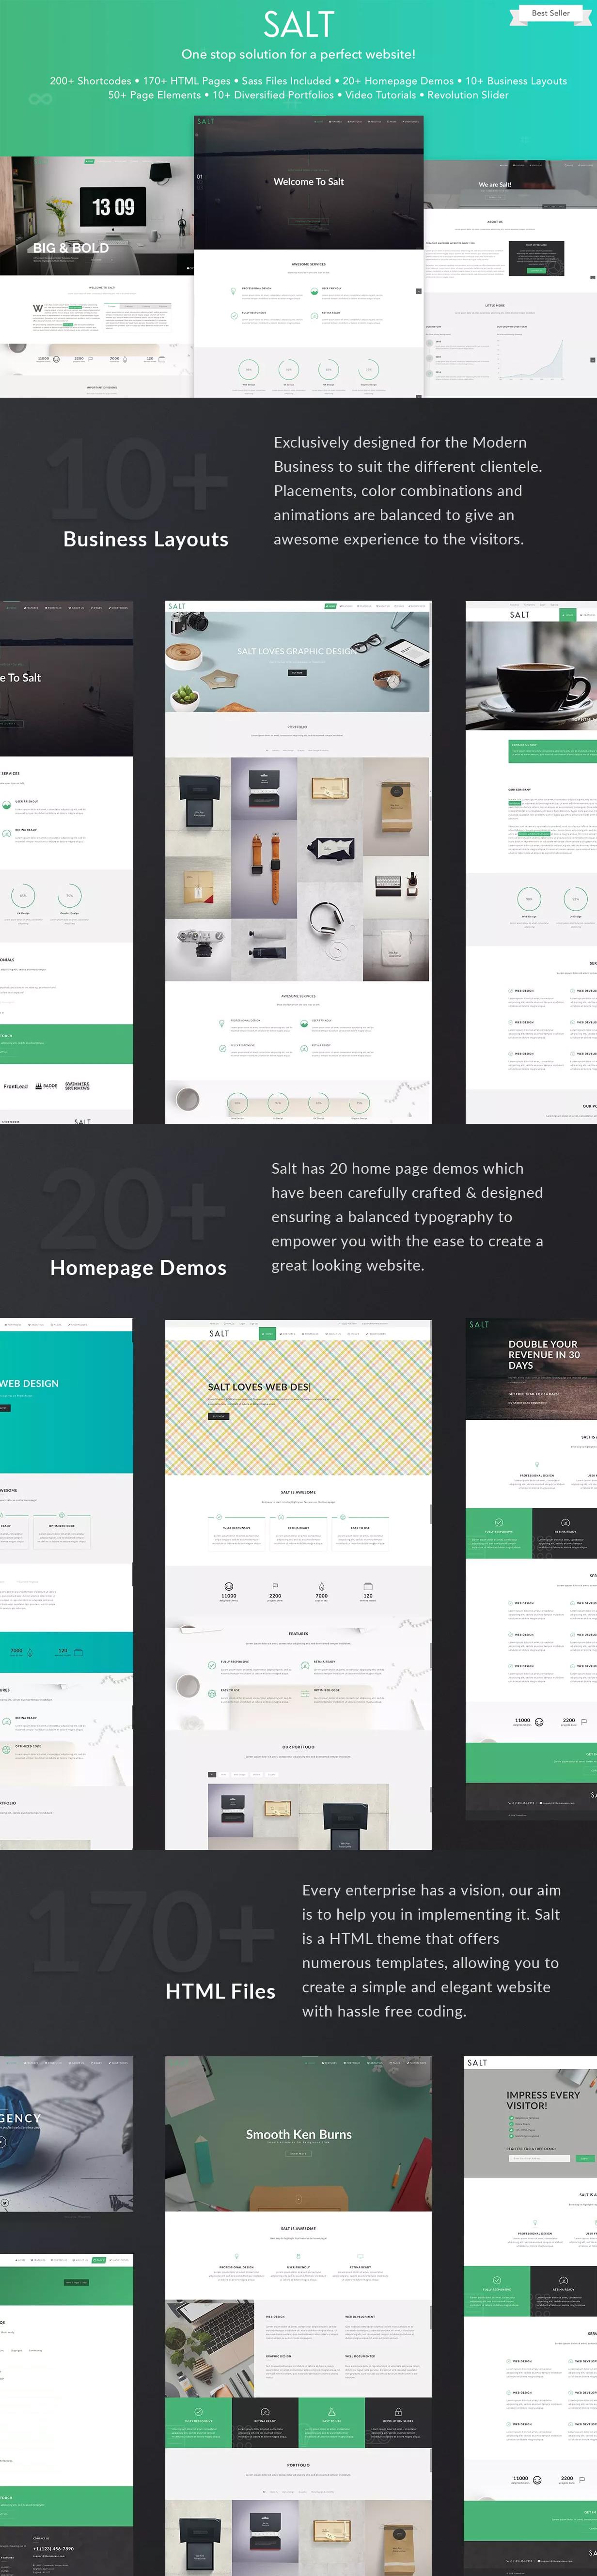 Salt - Multipurpose Business Website Template HTML | HTML Website ...